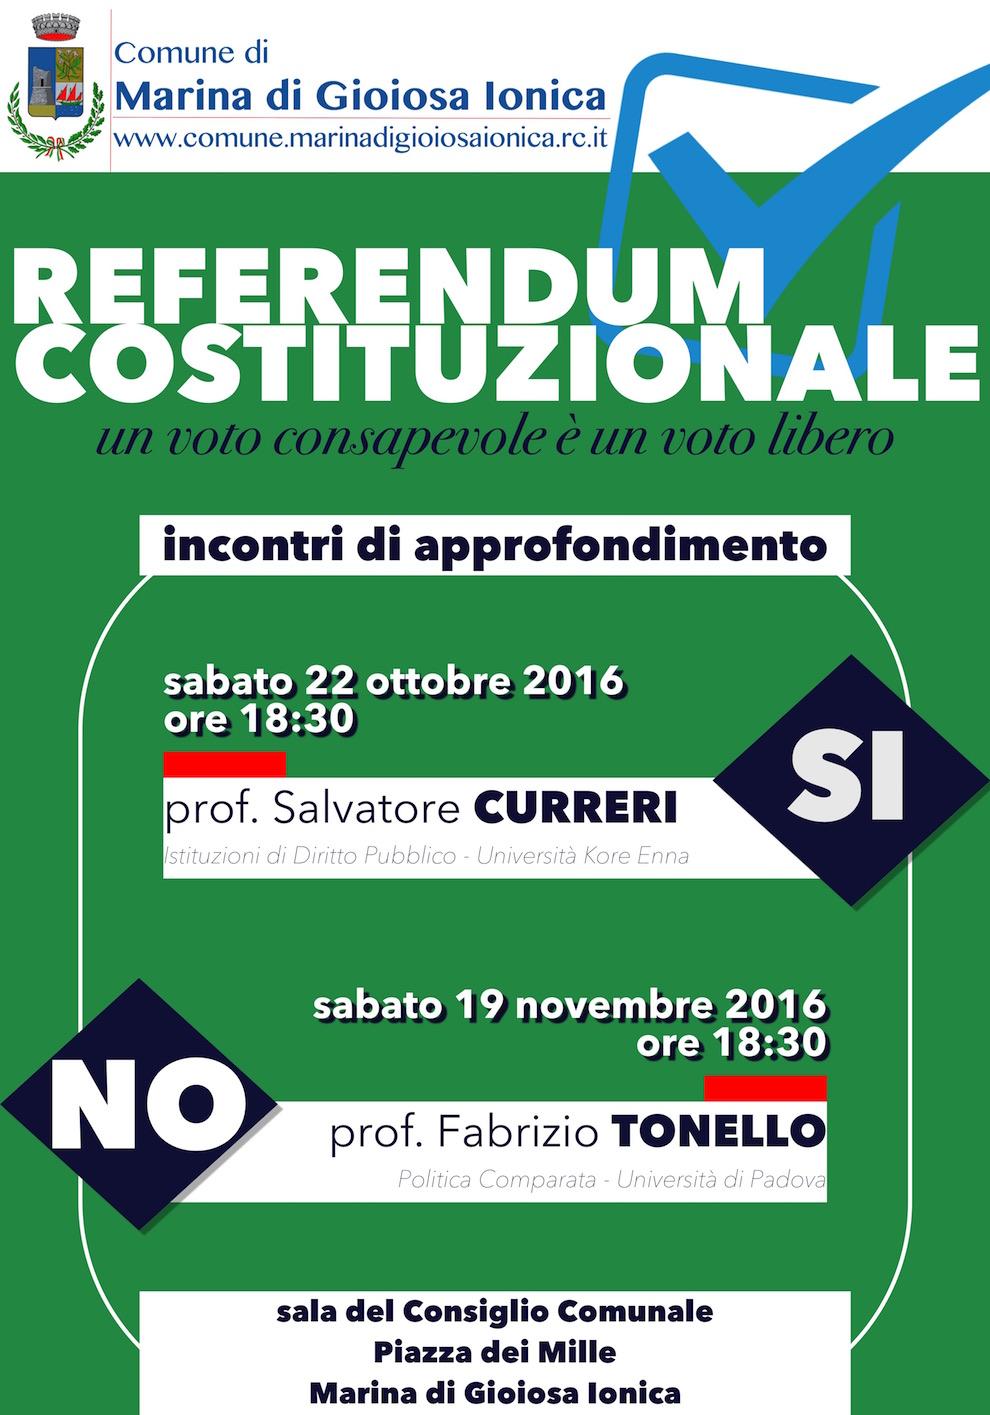 incontri-referendum-costituzionale